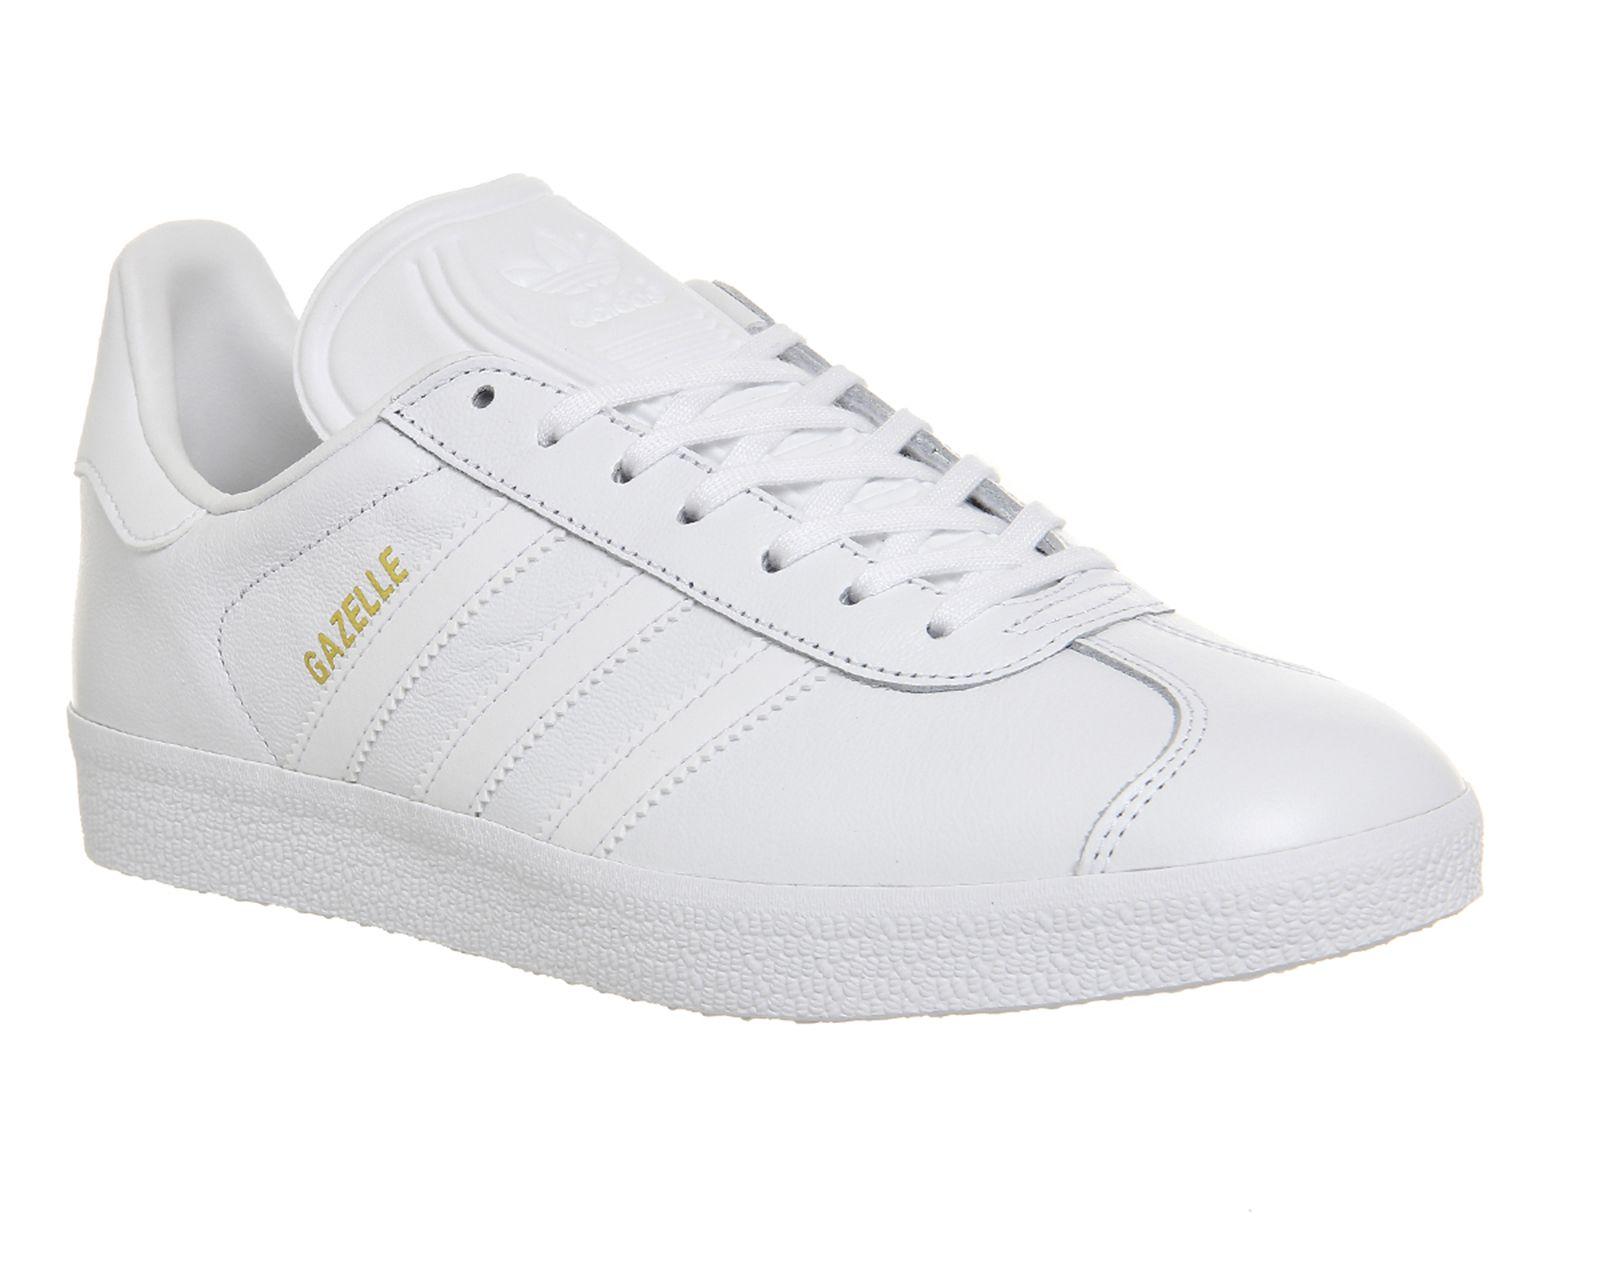 Adidas casual shoes, Adidas gazelle